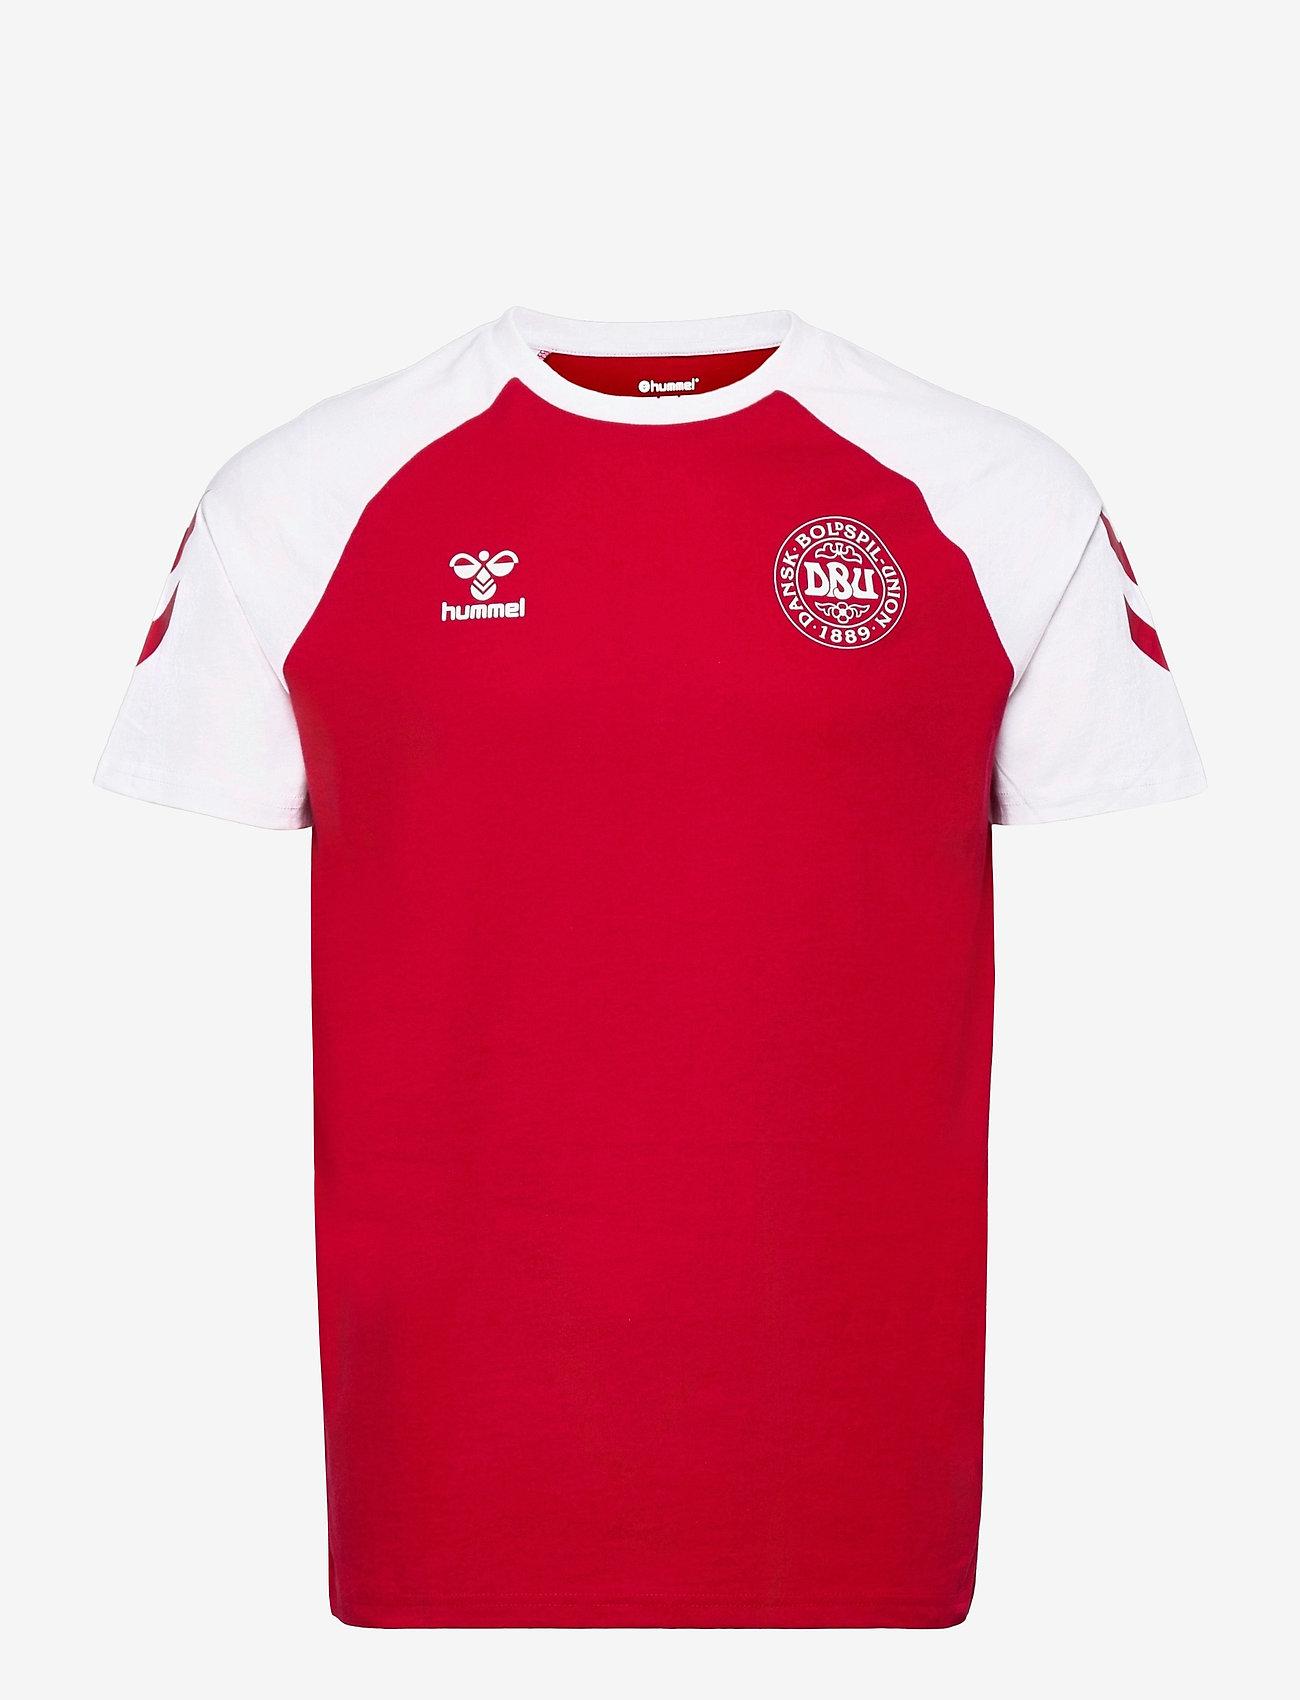 Hummel - DBU FAN 2020 COT. TEE S/S - football shirts - tango red - 0